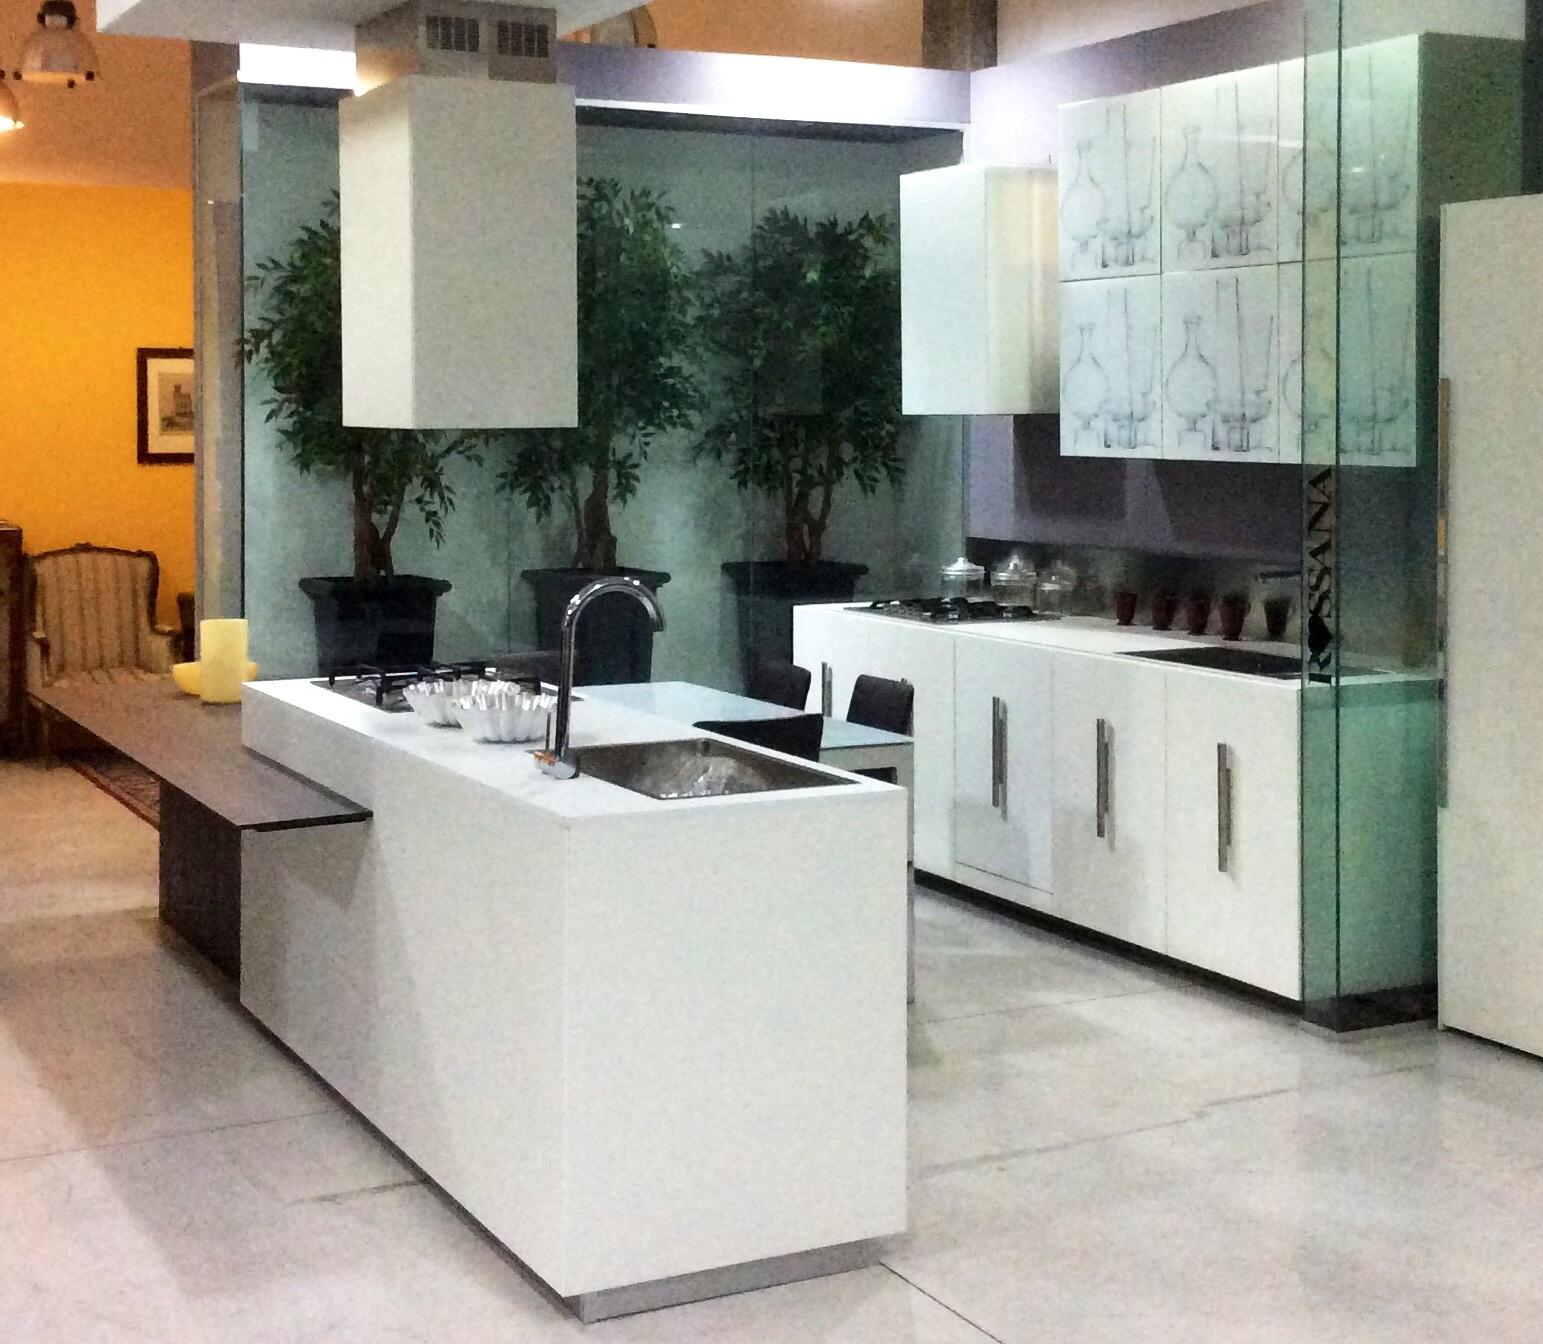 Cucina composit mood design laminato materico bianca for Tavolo isola cucina